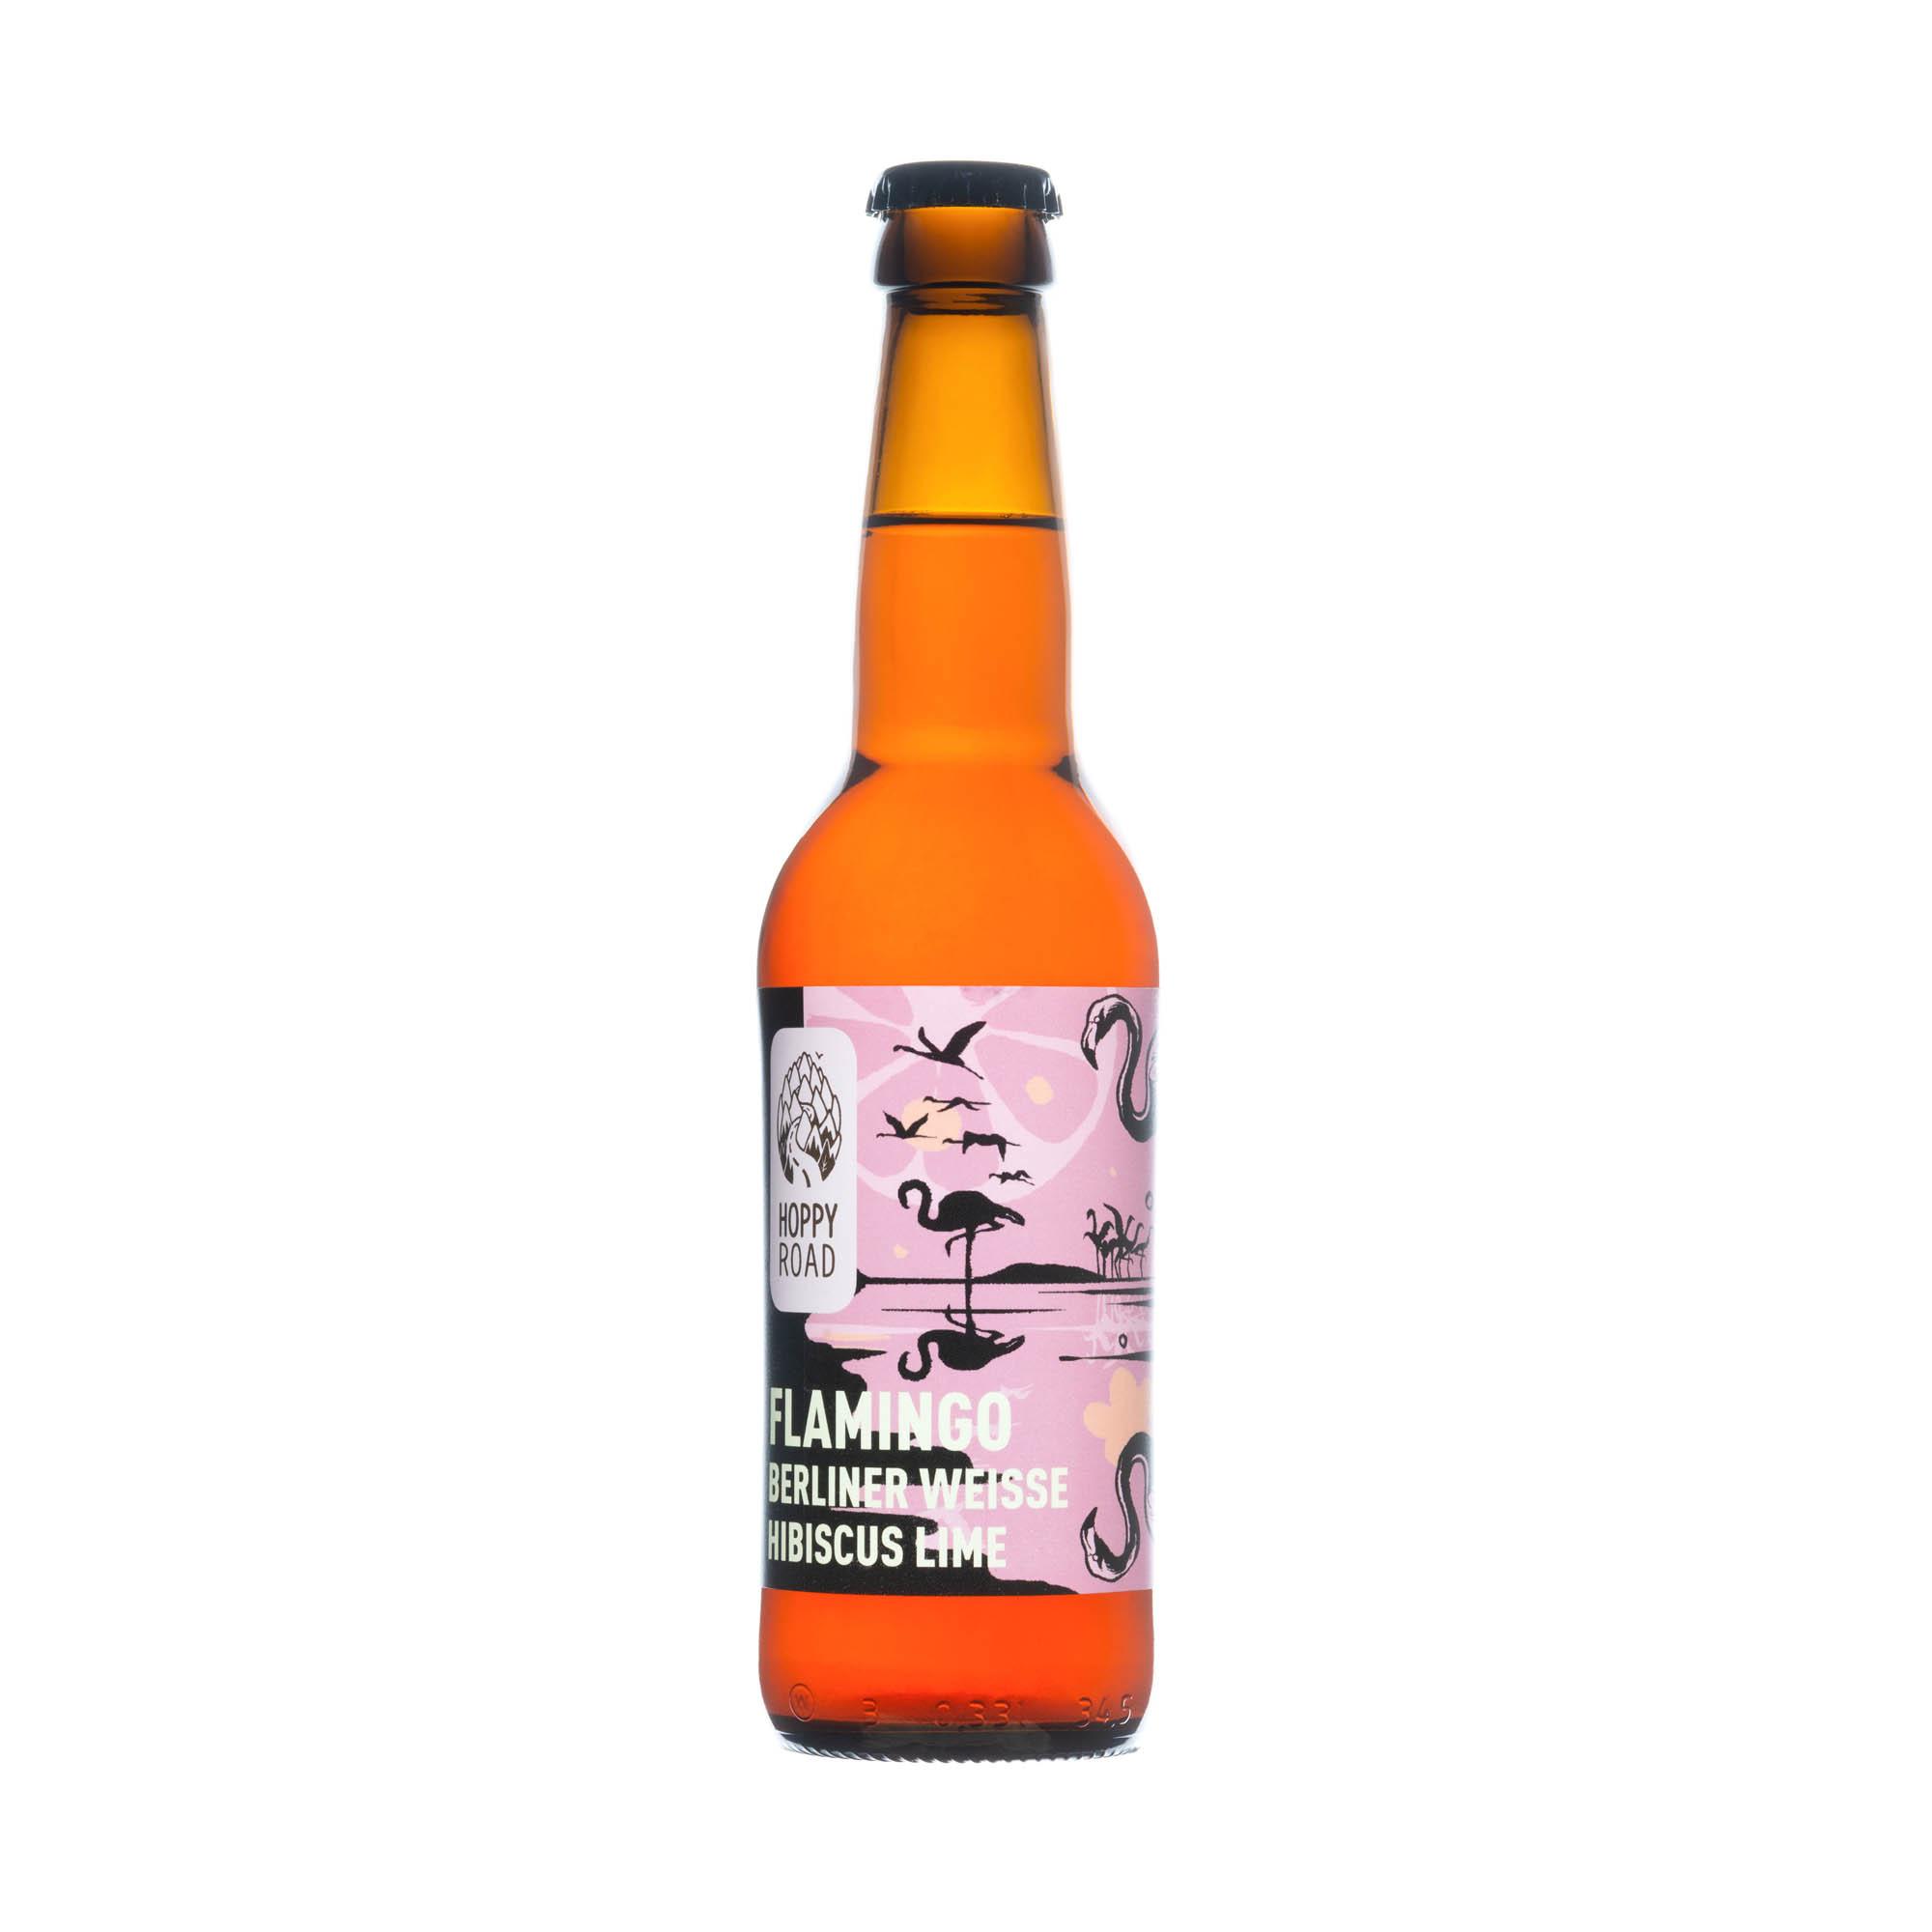 Flamingo - Hoppy Road - Ma Bière Box